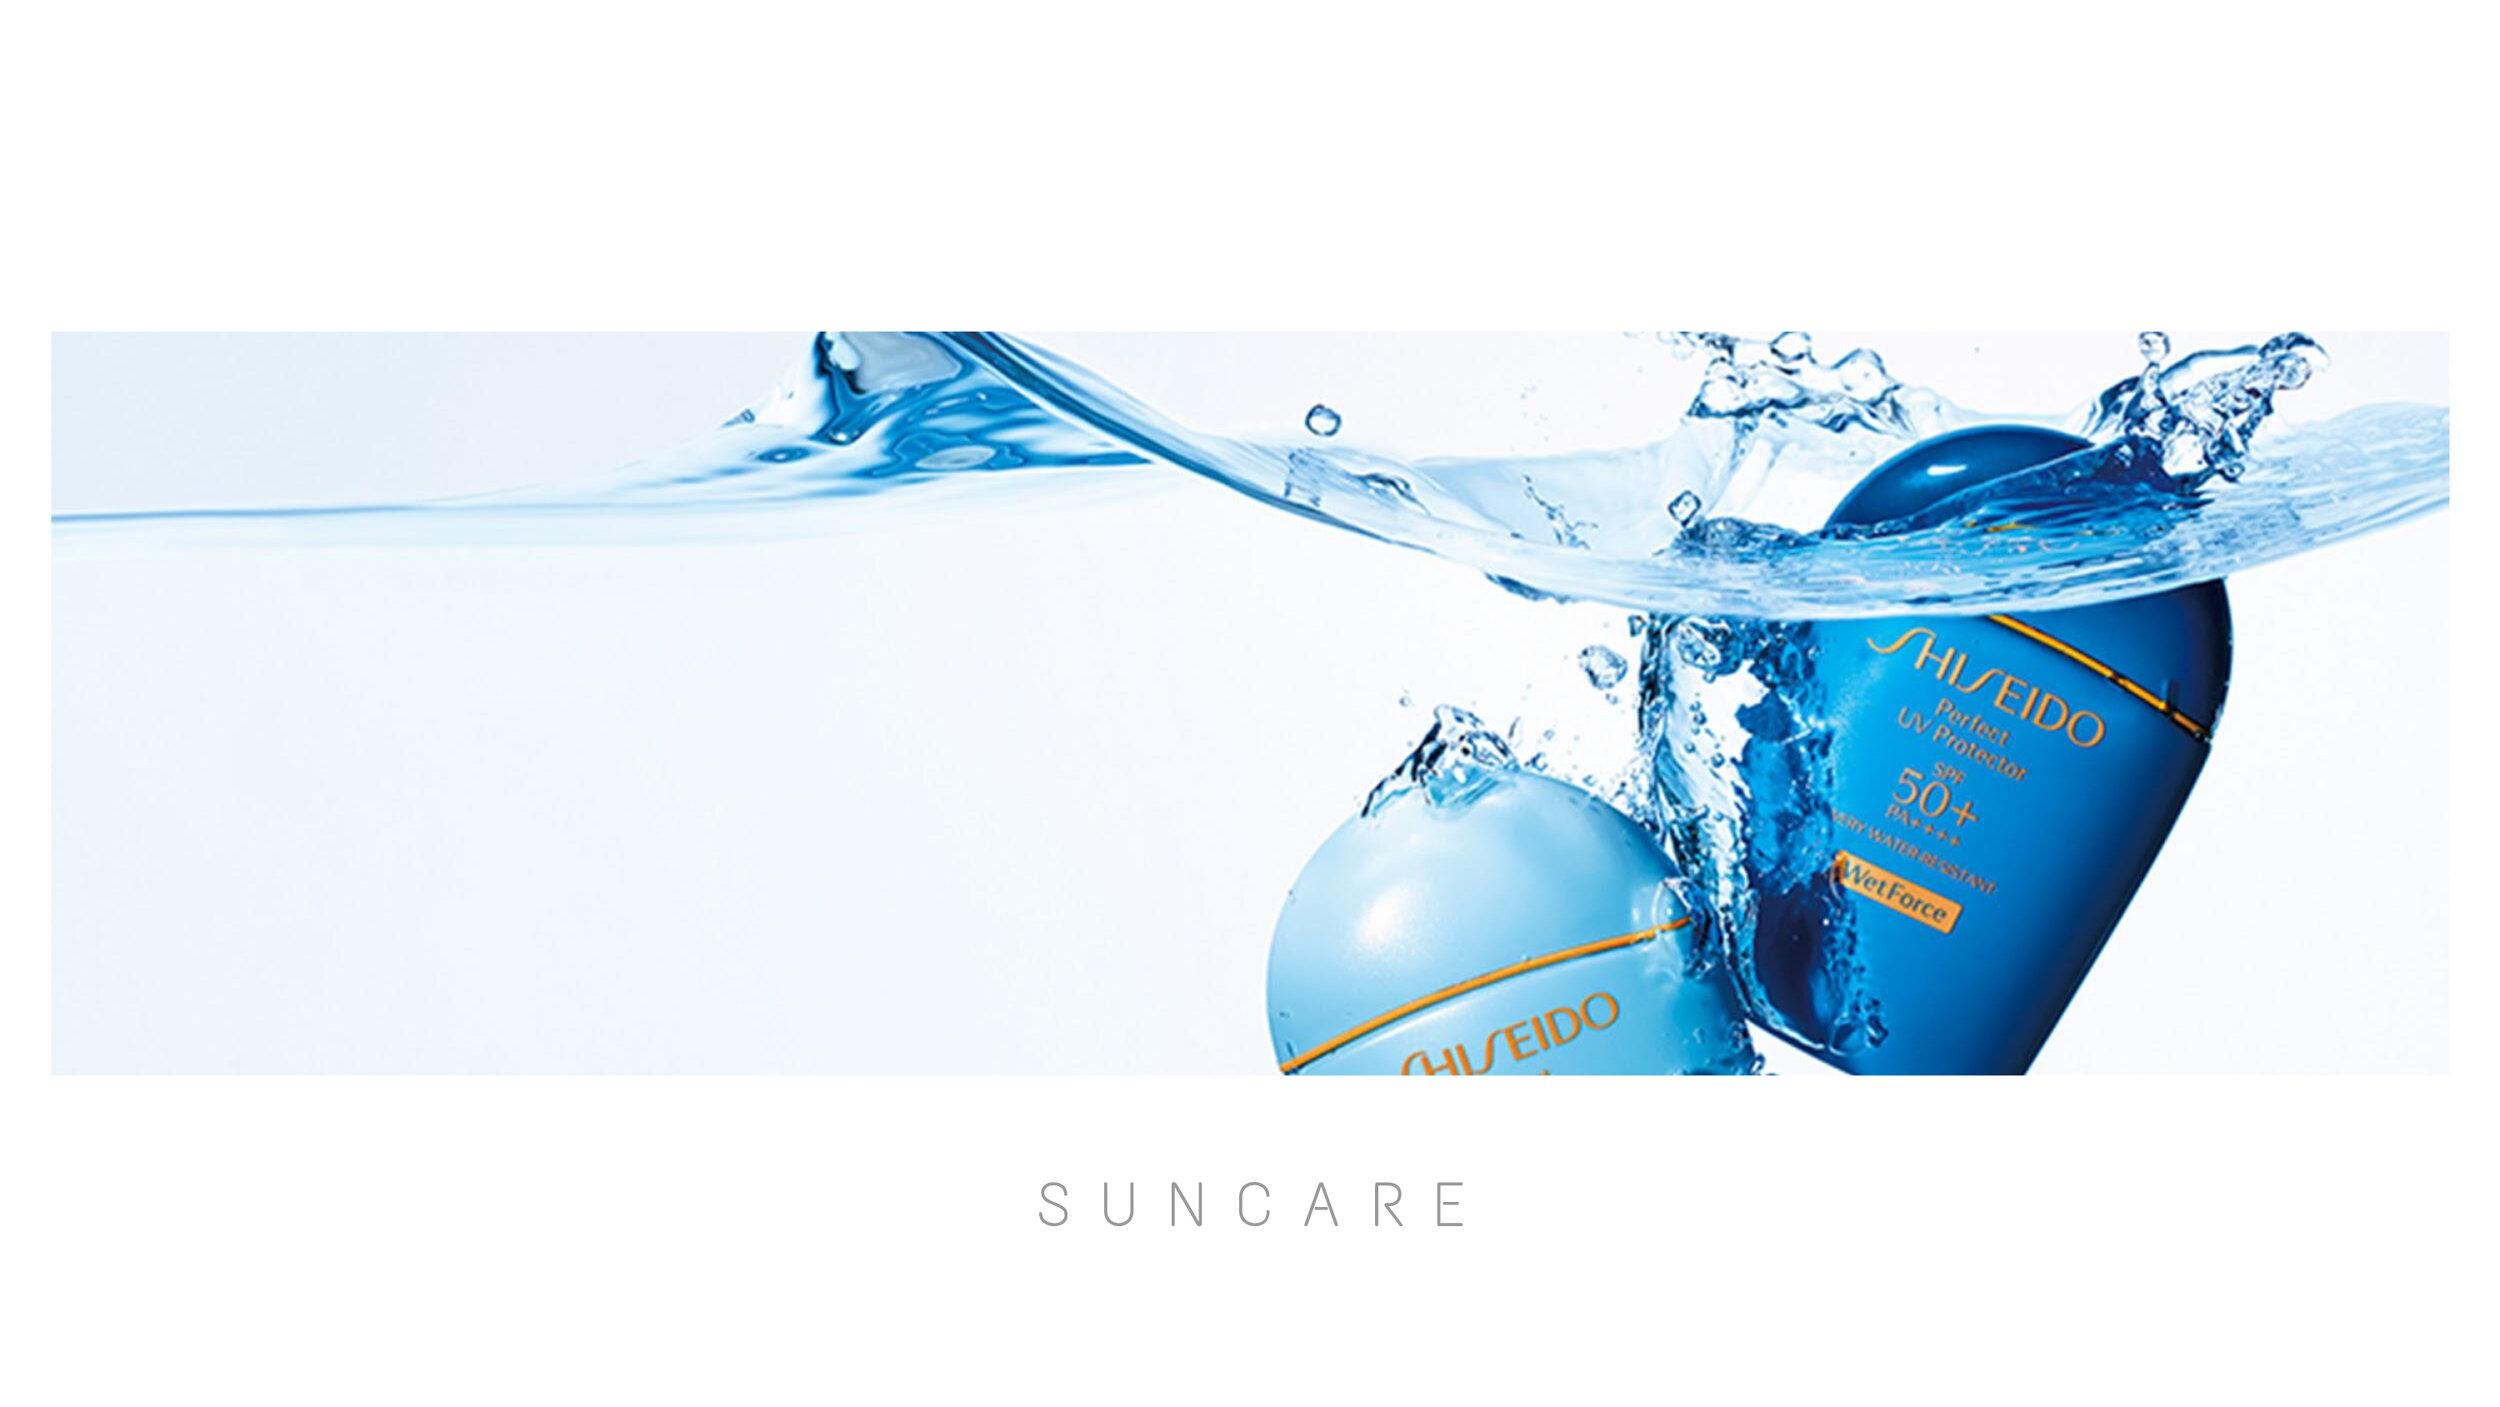 shiseido_brandbook_suncare1.jpg